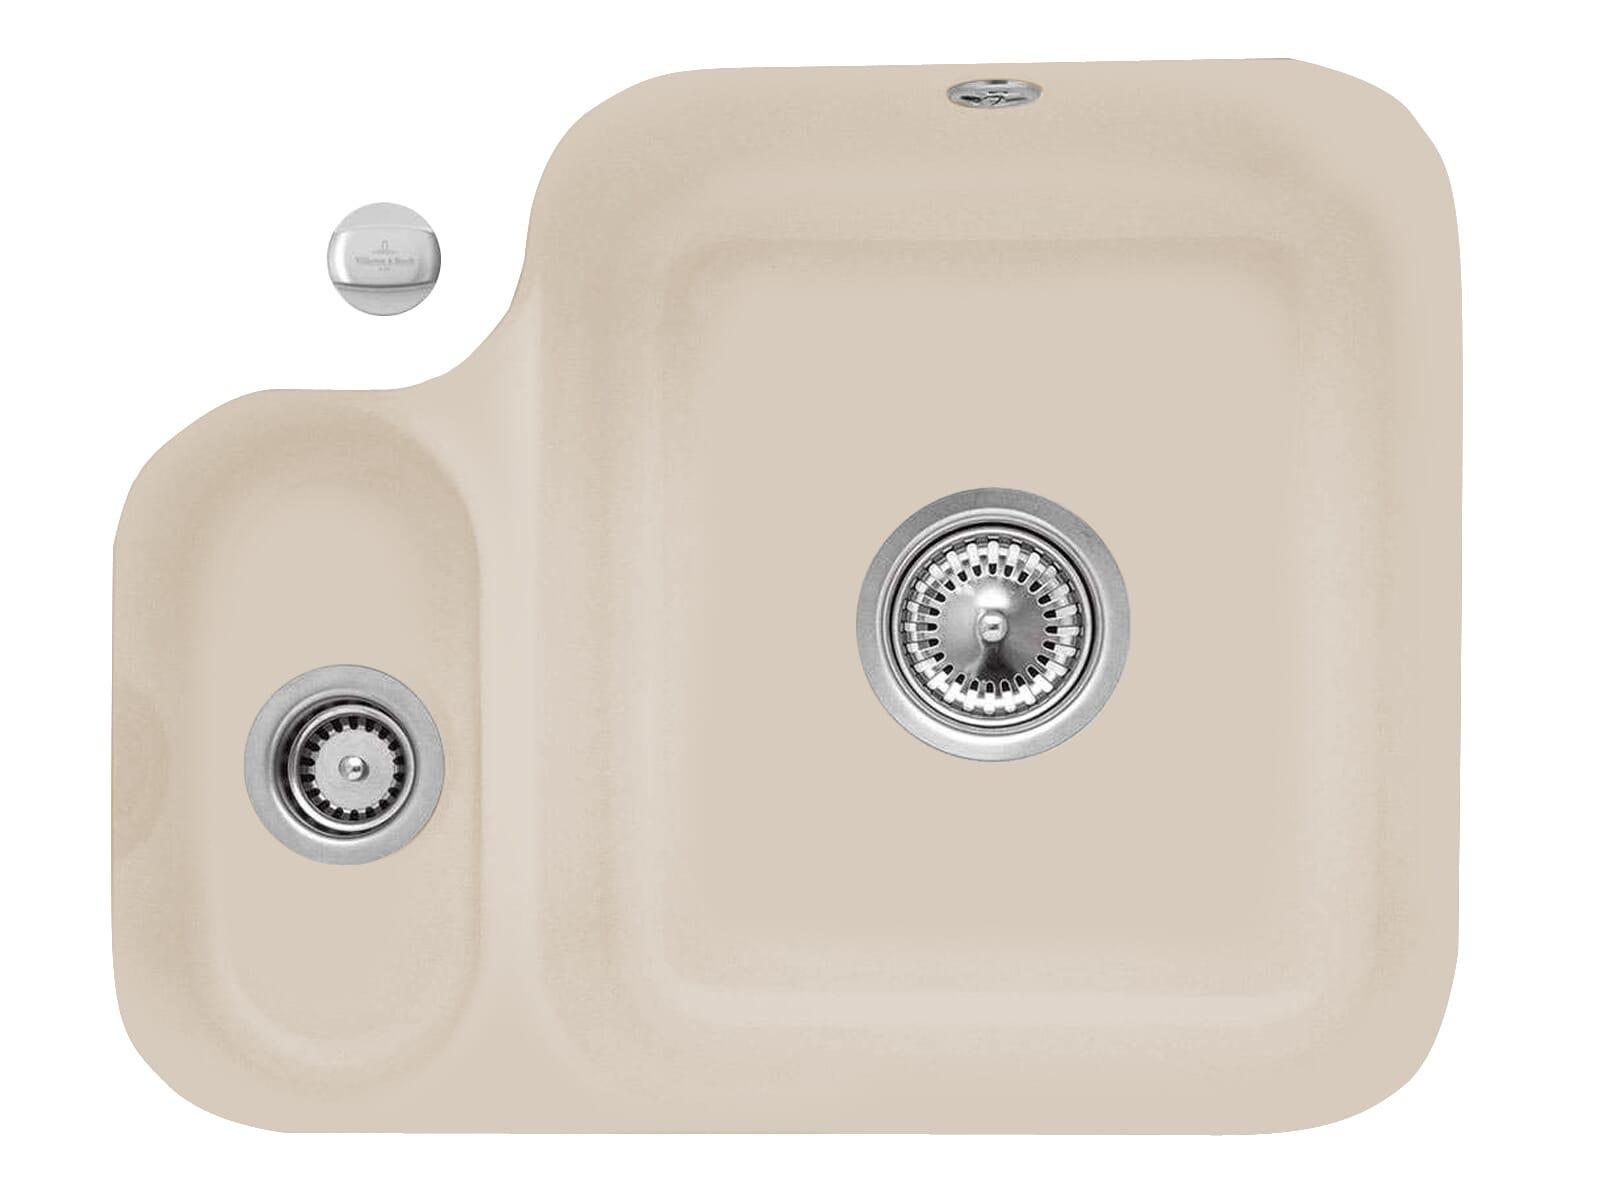 Villeroy & Boch Cisterna 60B Almond - 6702 02 AM Keramikspüle Exzenterbetätigung